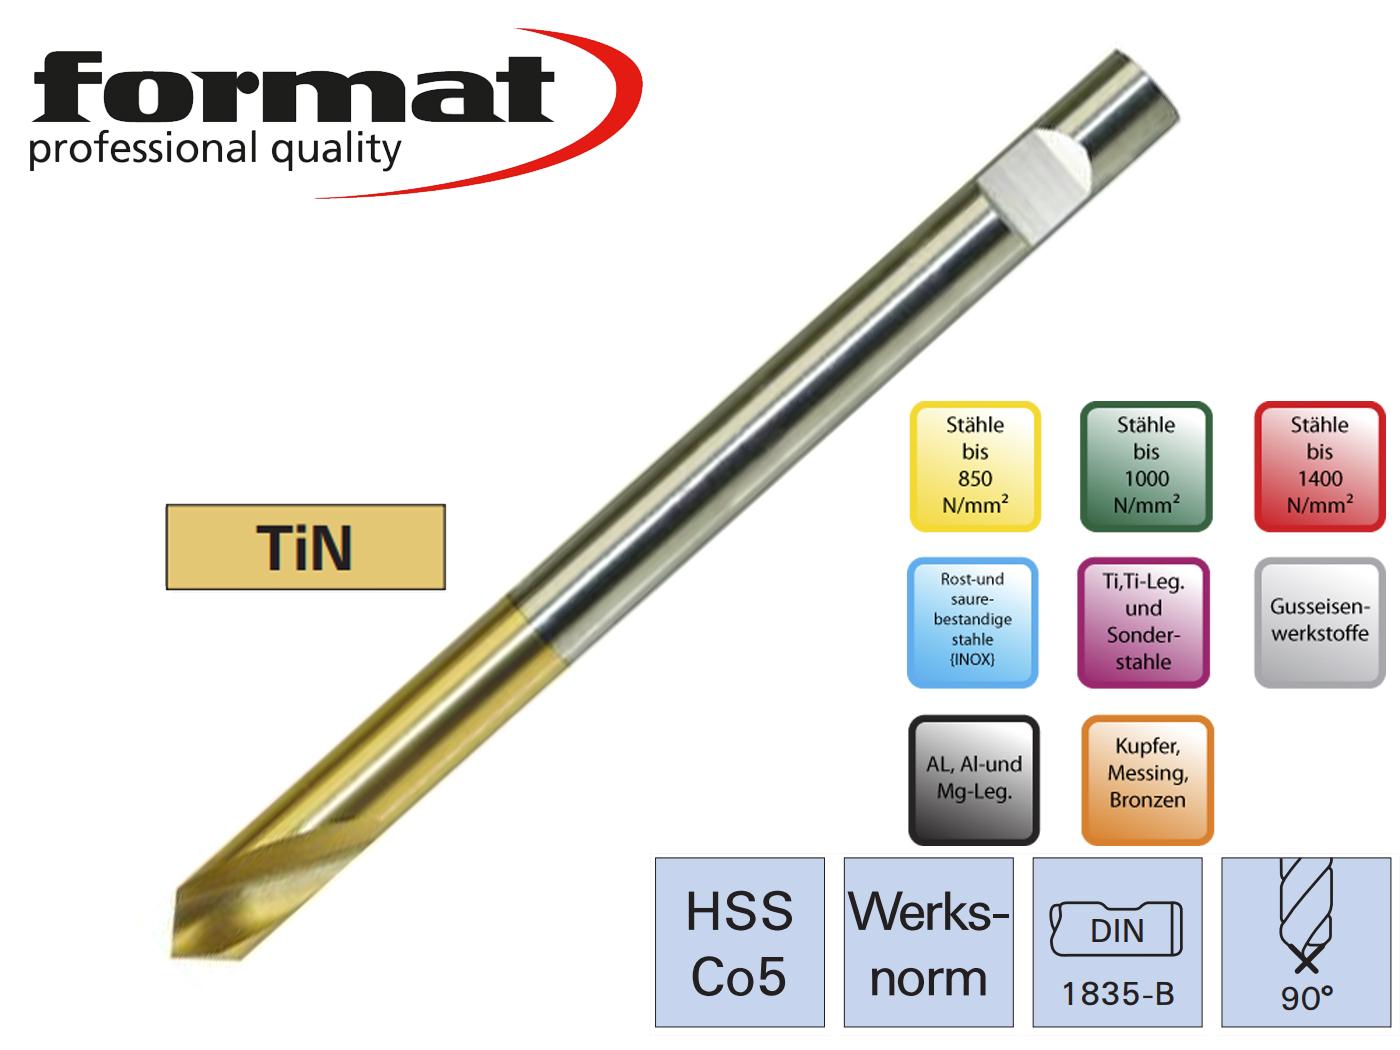 Centerboor NC DIN 1835 B HSSCo5 90G lang FORMAT | DKMTools - DKM Tools